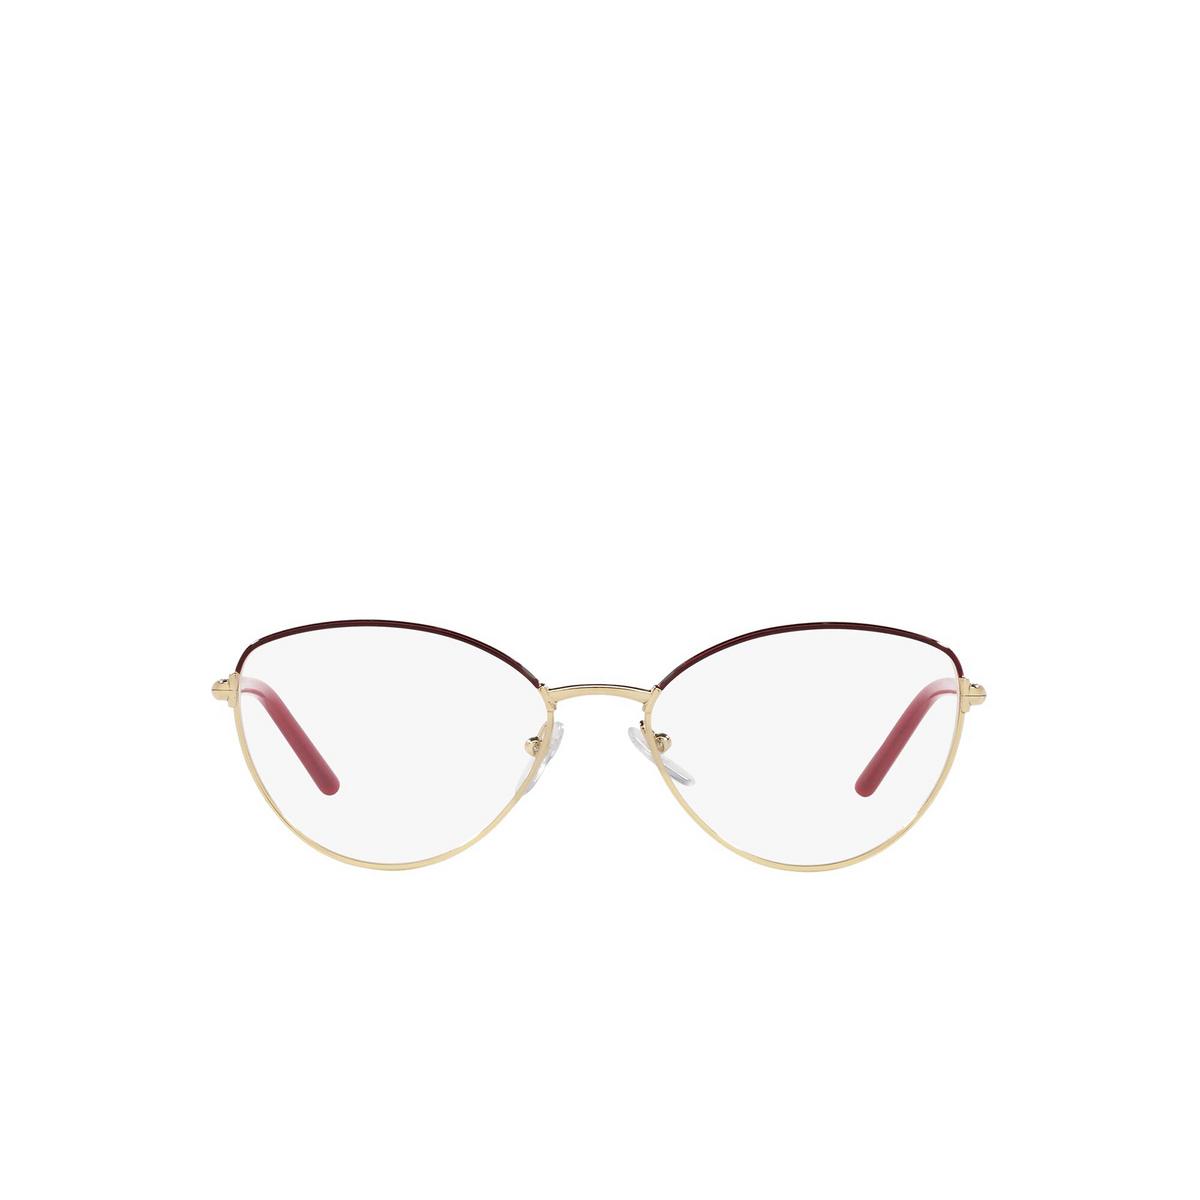 Prada® Butterfly Eyeglasses: PR 62WV color Bordeaux / Gold FHX1O1 - front view.